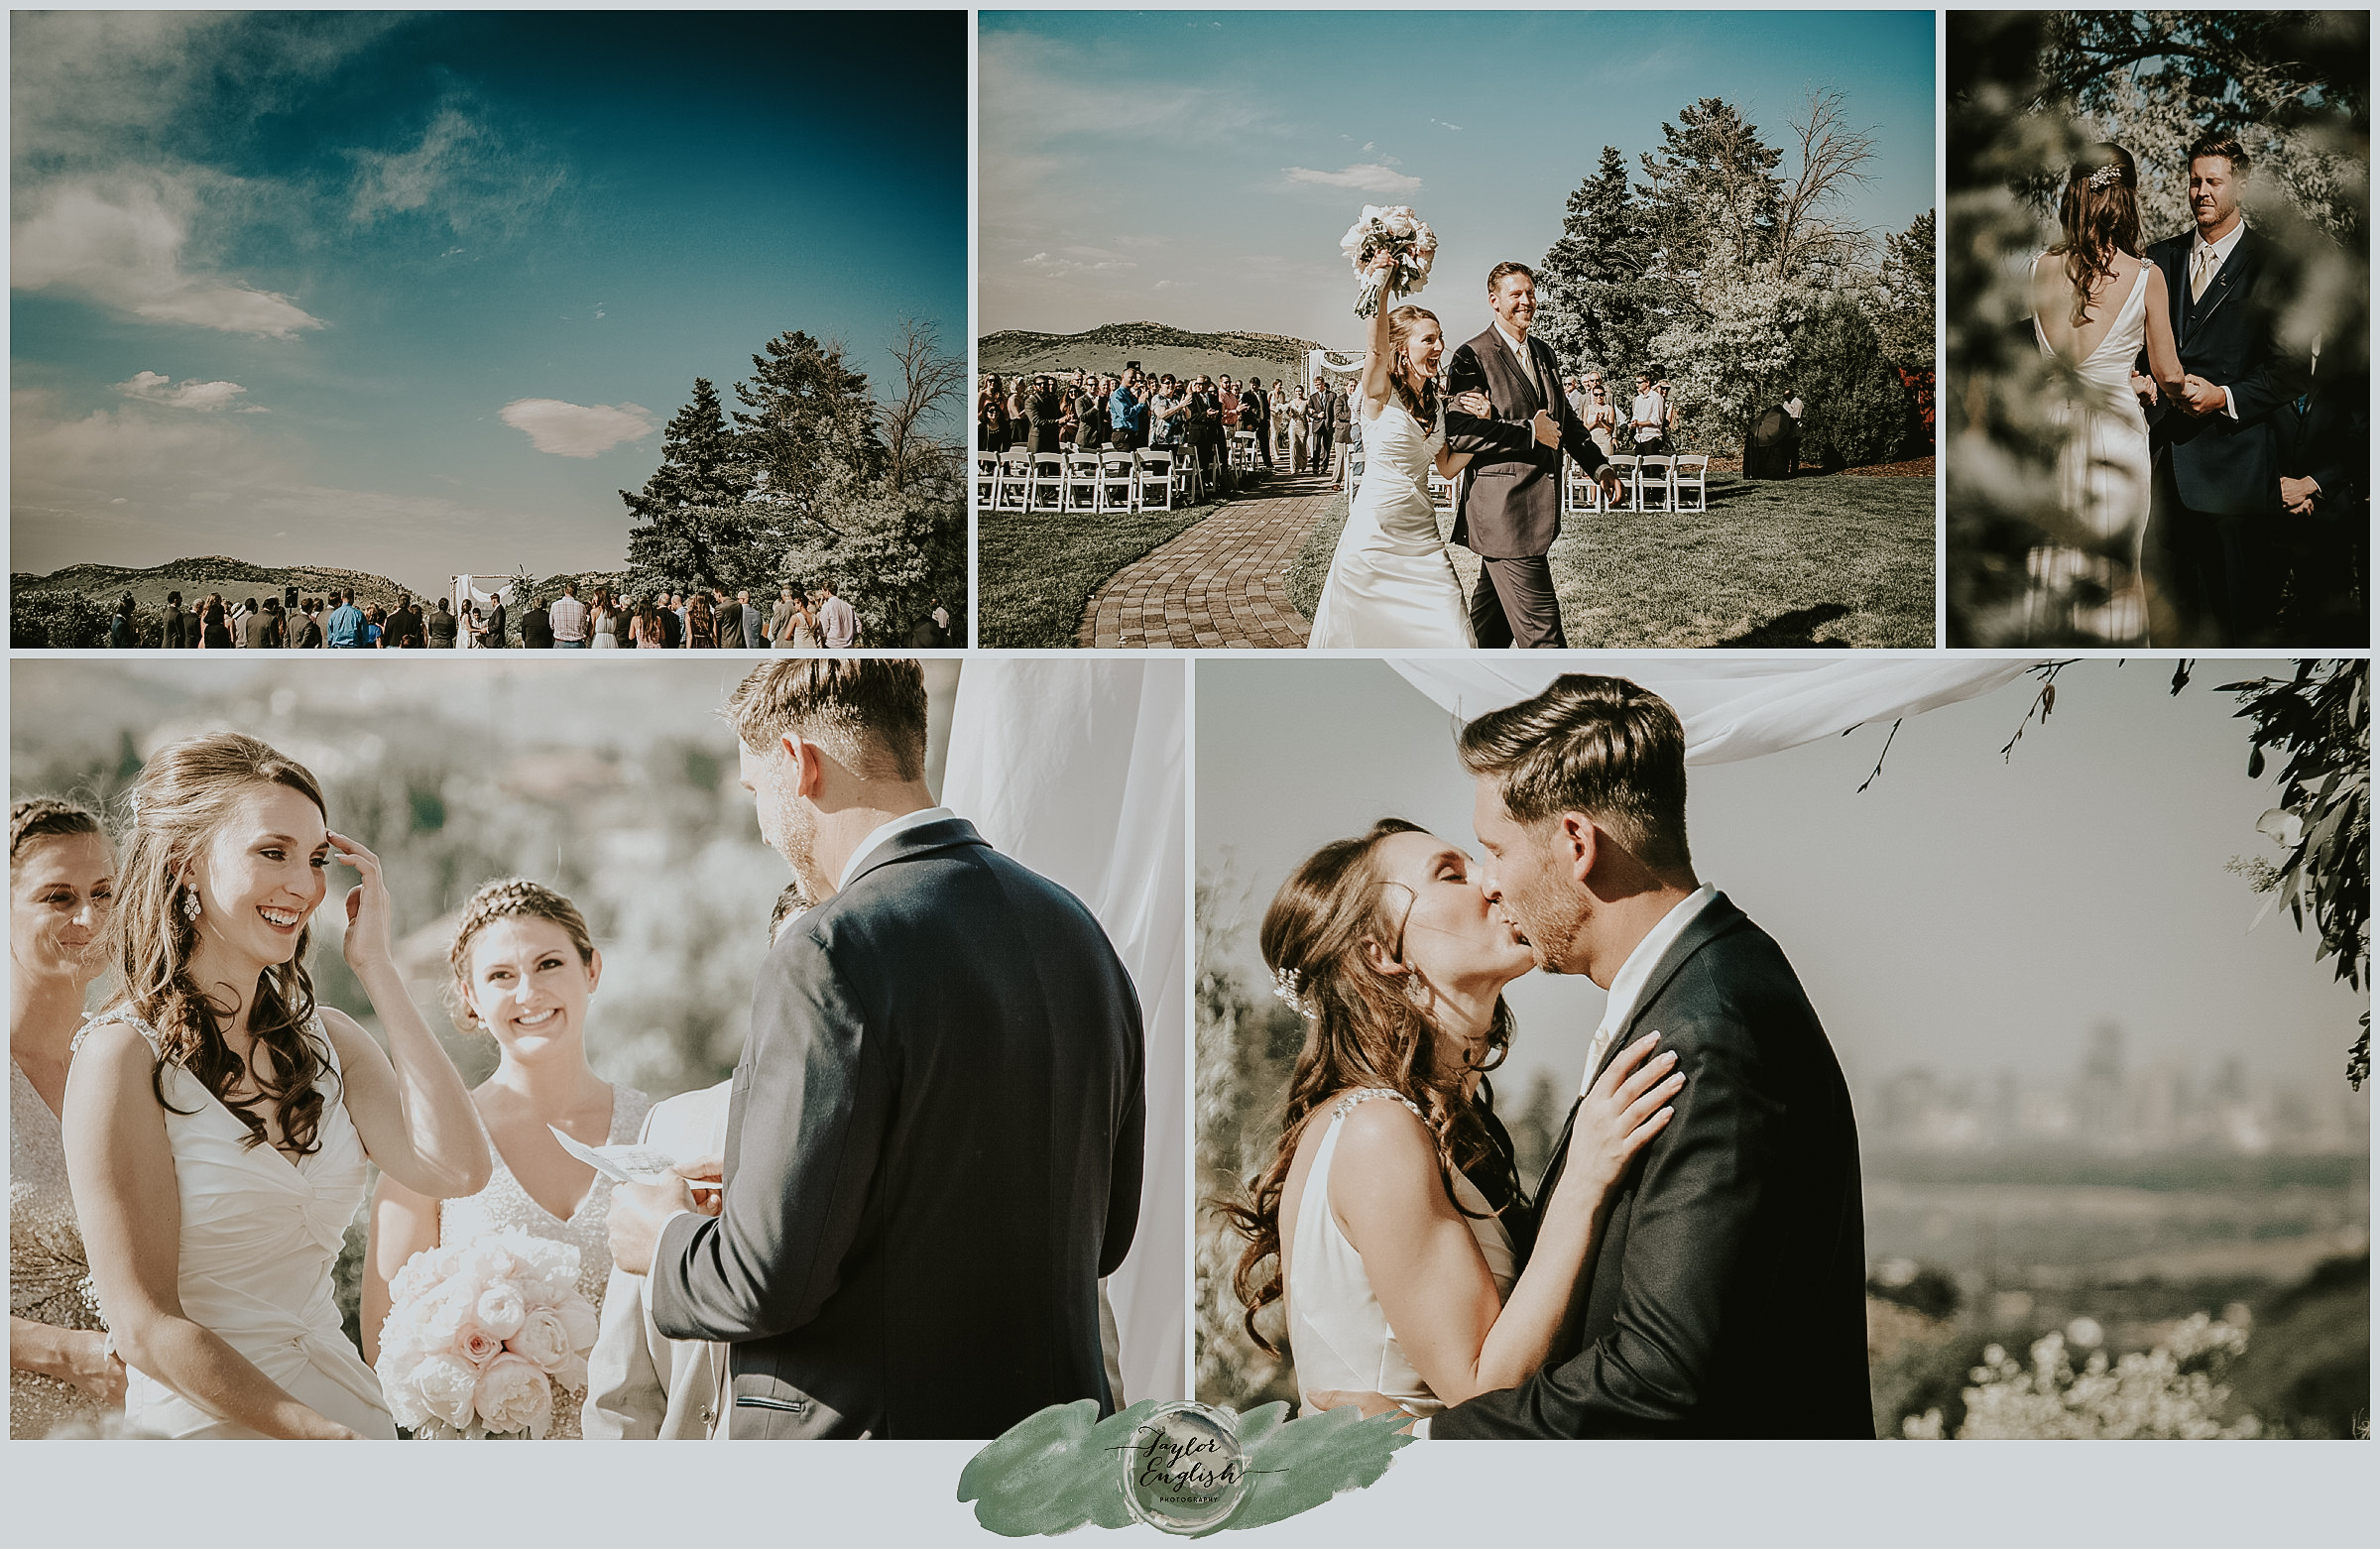 Chattanooga_Wedding_Photographer_Littleton_Colorado6